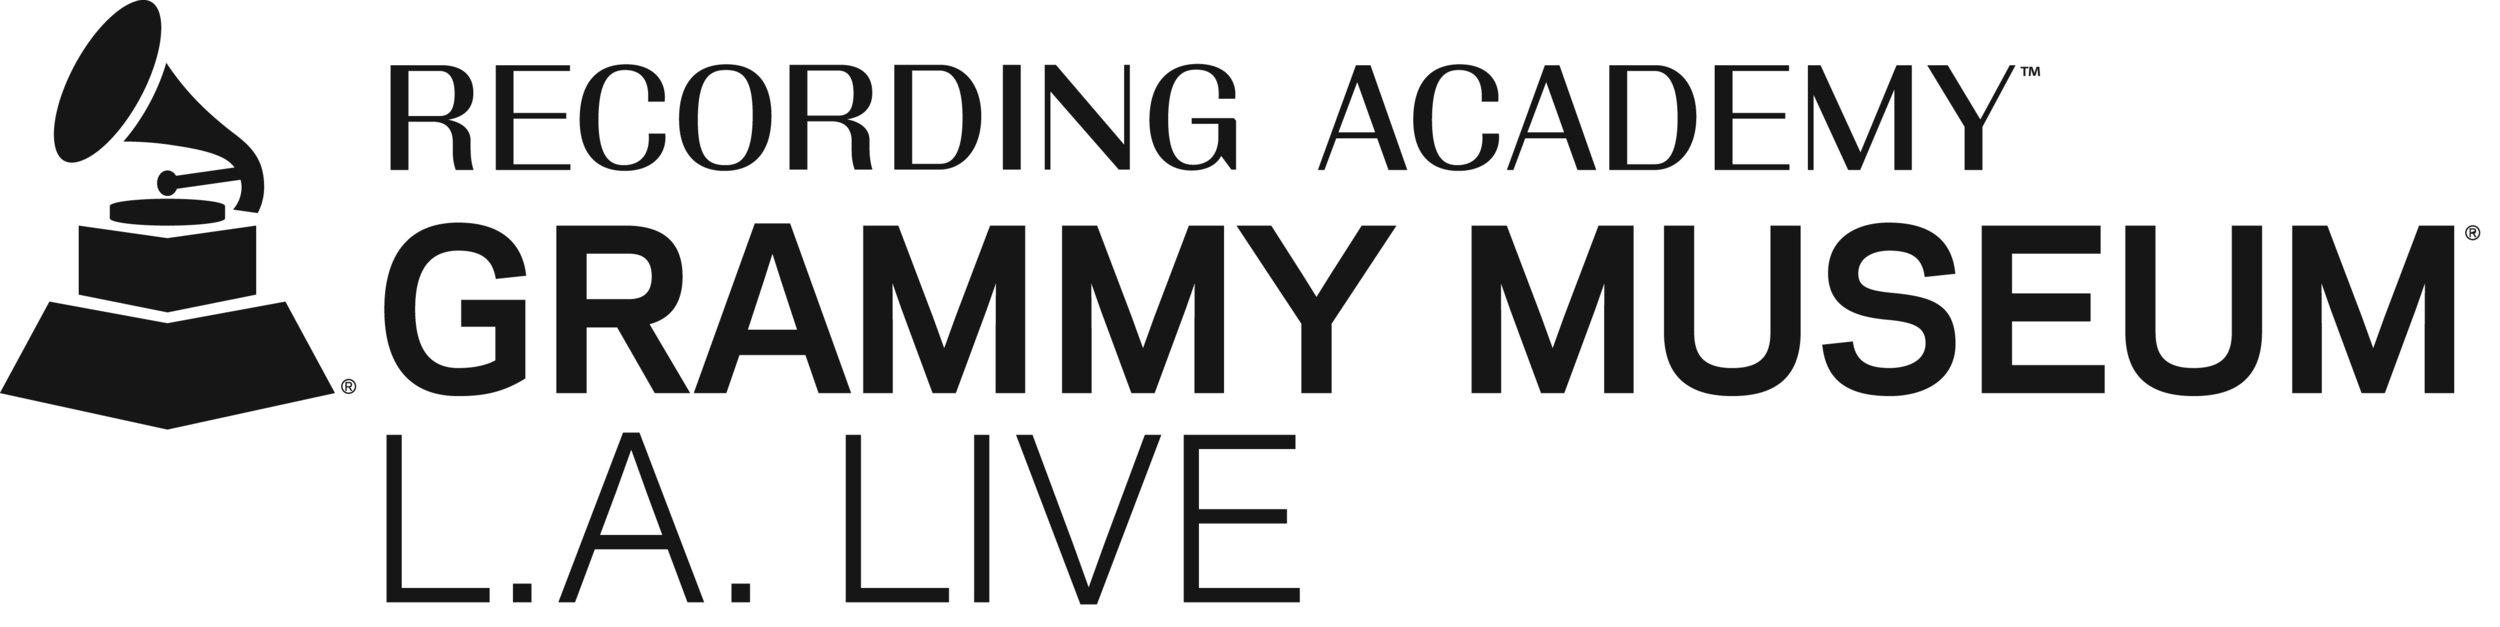 Recording Academy Grammy Museum.jpg